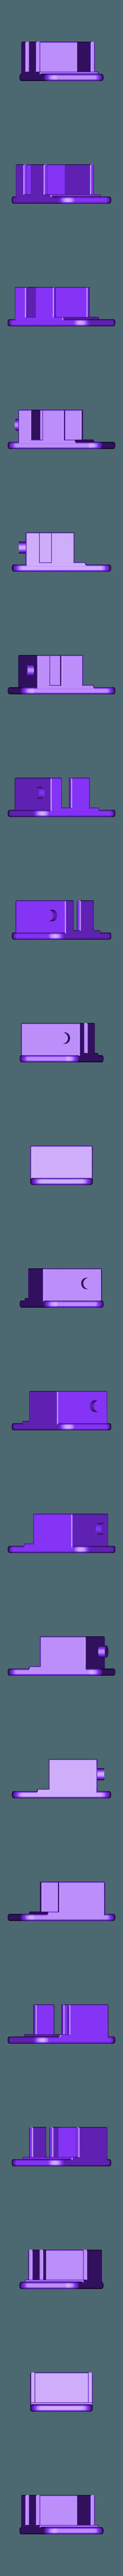 Tilt Base.stl Download STL file FPV Pan Tilt Mount for FPV and HD Cameras • 3D printable template, alishanmao